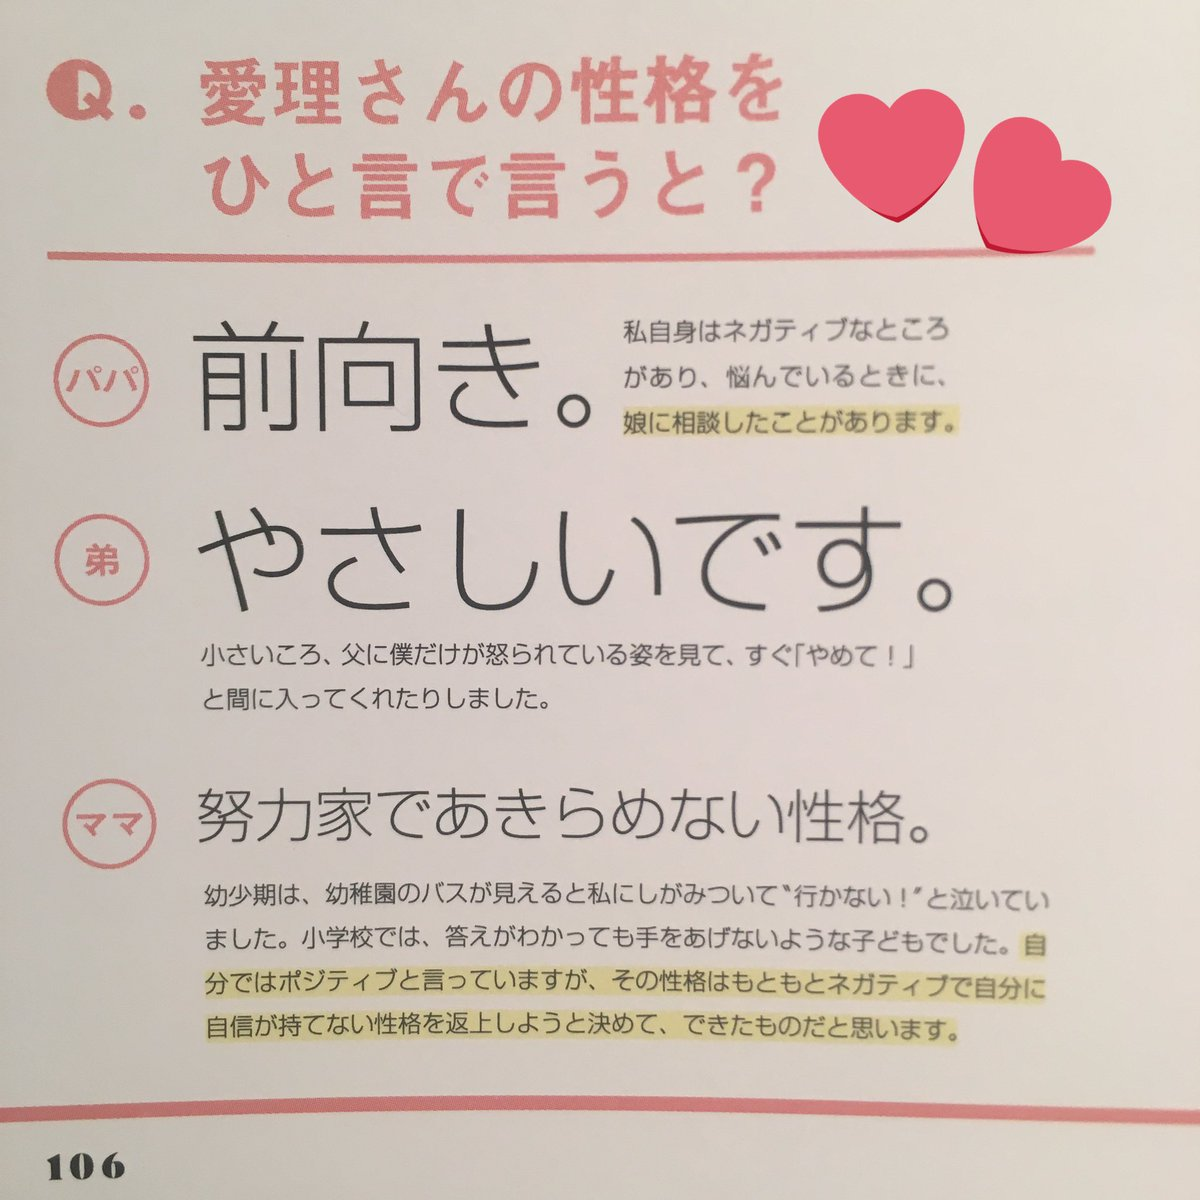 ℃-ute鈴木愛理「あいりまにあ」がオリコン週間1位と爆売れしている! [無断転載禁止]©2ch.netYouTube動画>1本 ->画像>86枚